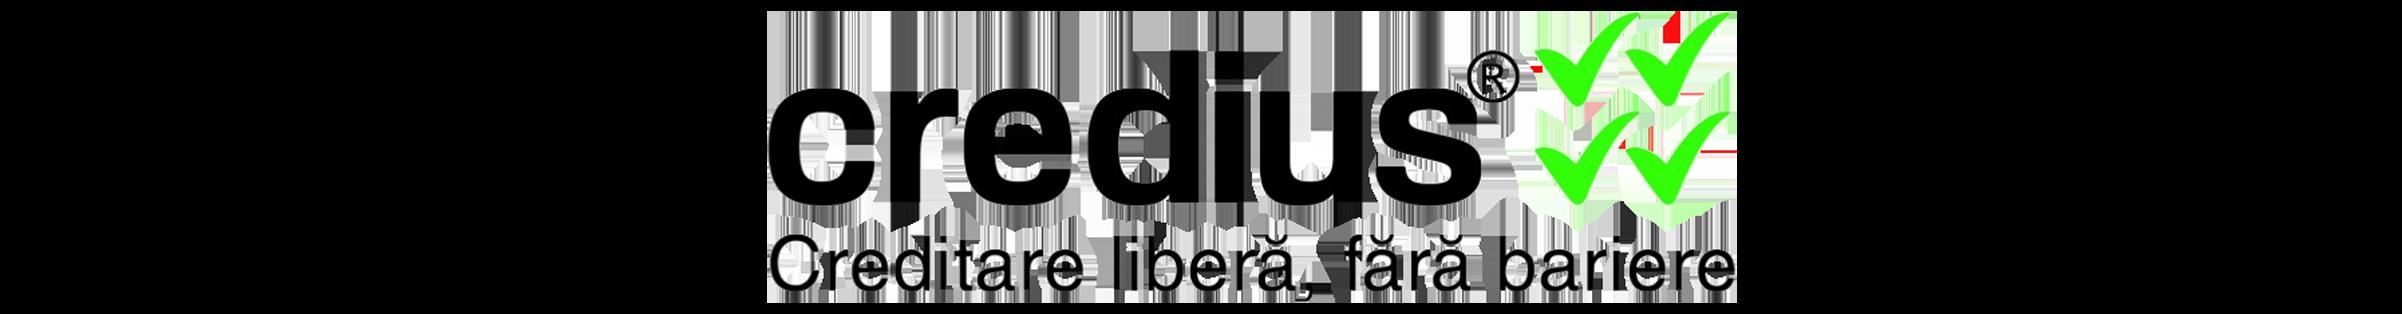 Credius Credit Online